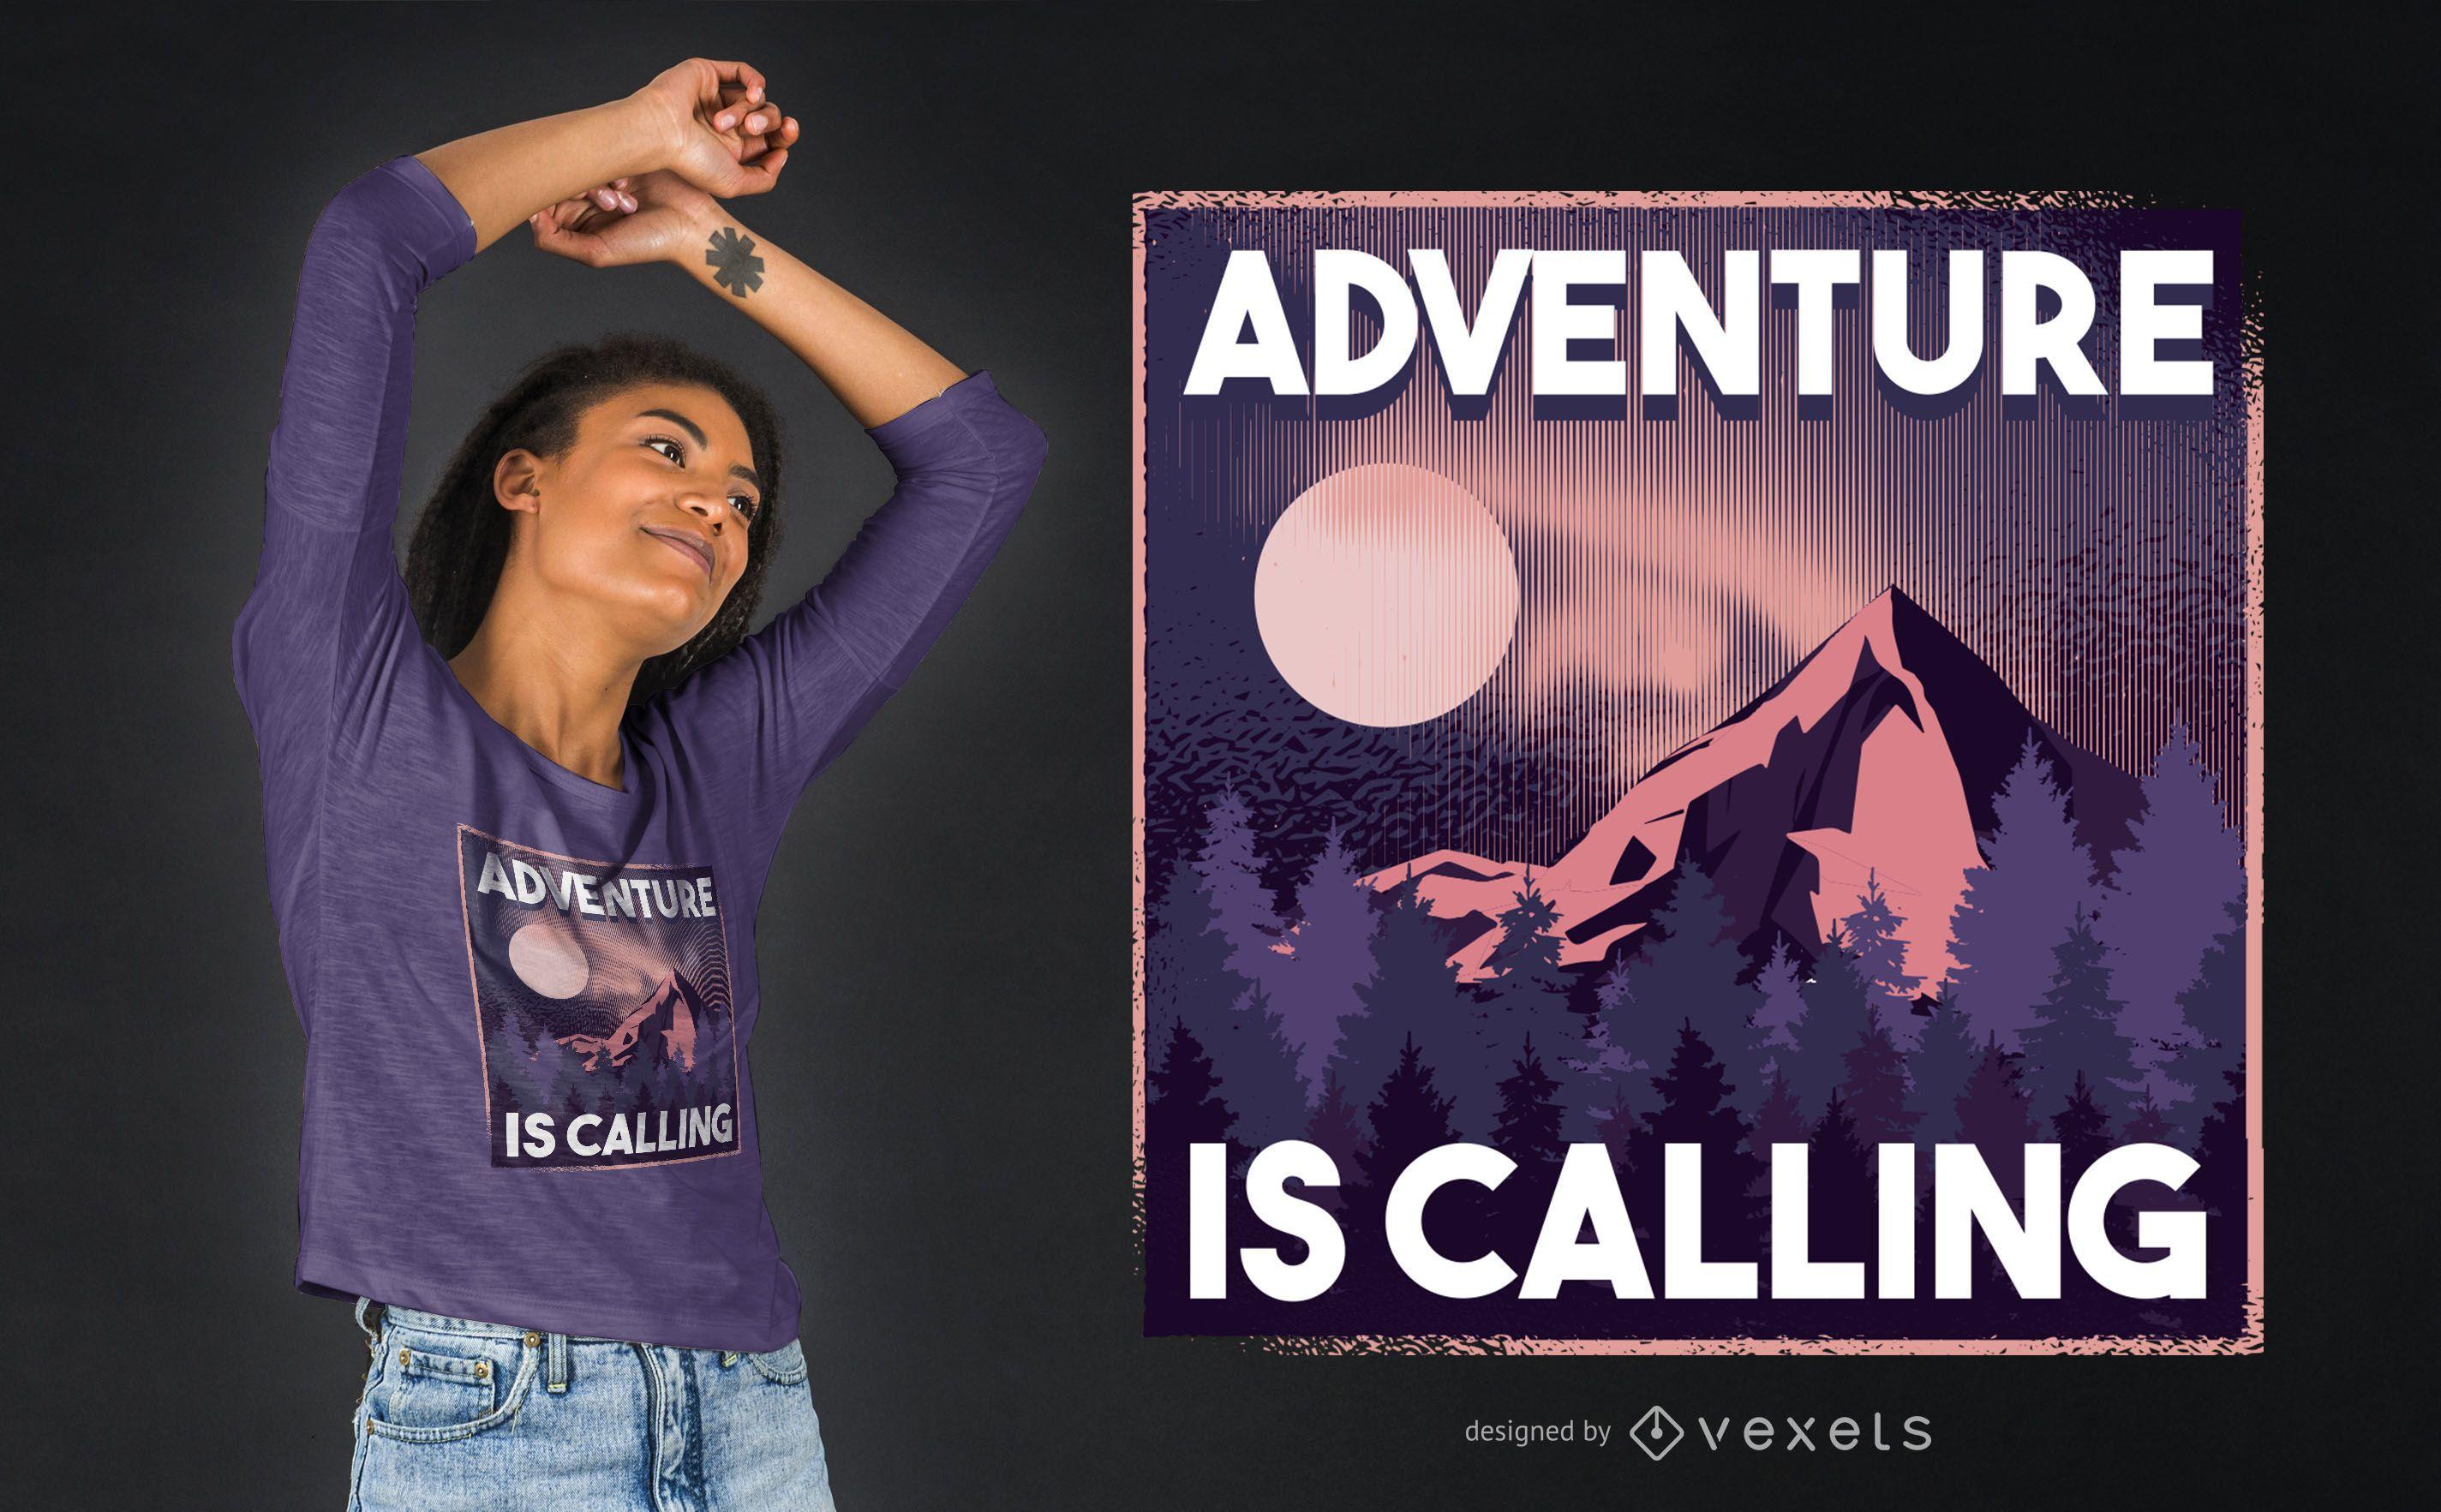 Adventure is calling t-shirt design